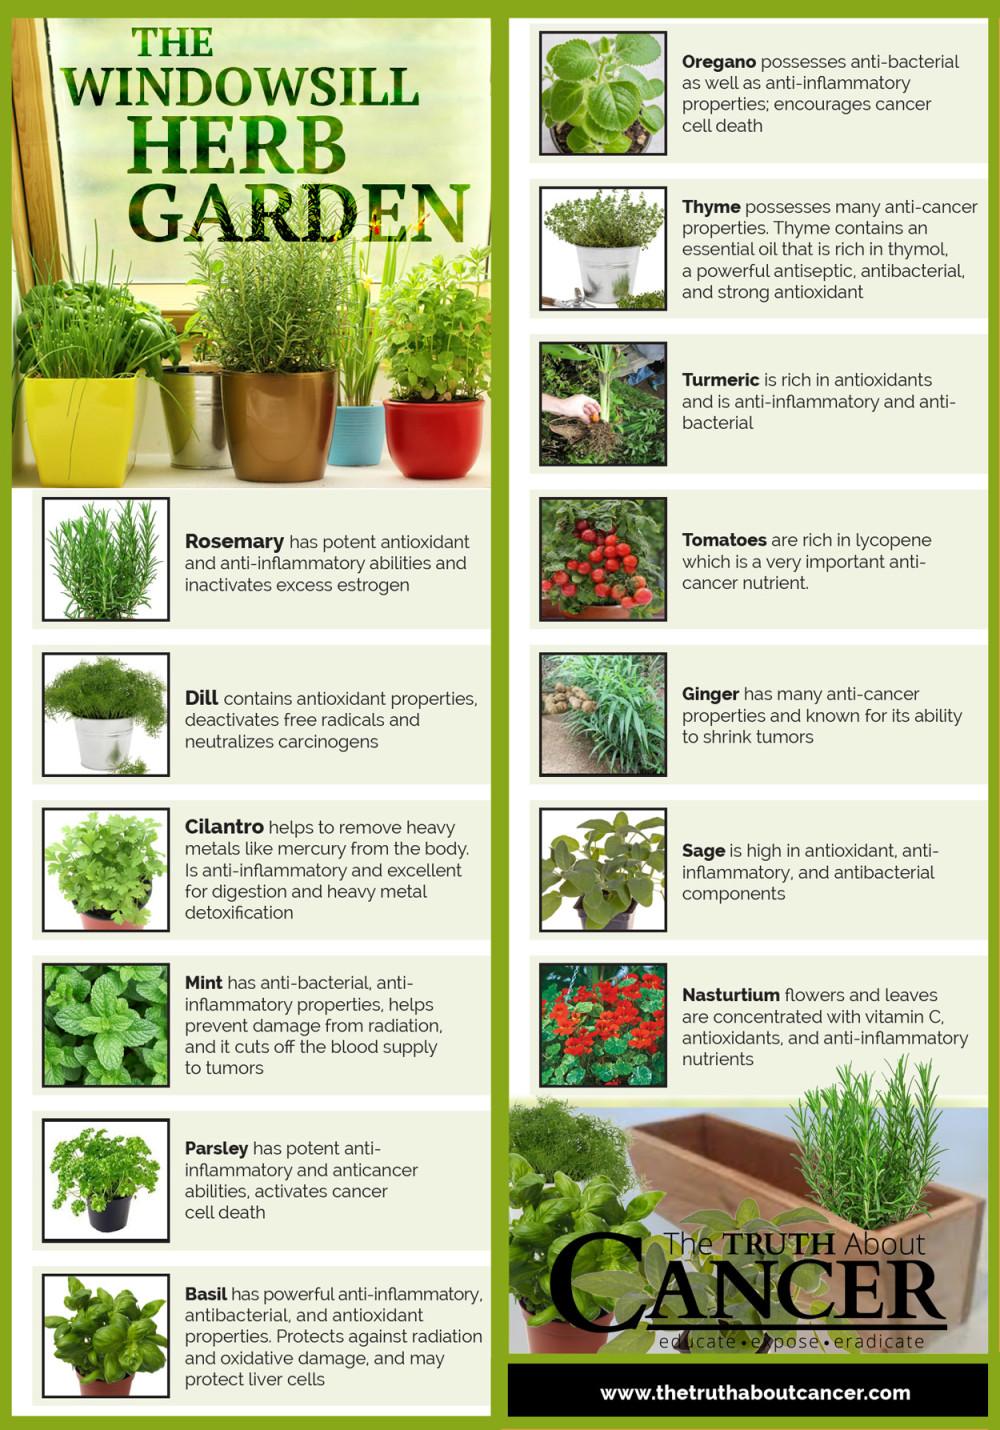 Windowshill-Herb-Garden-article